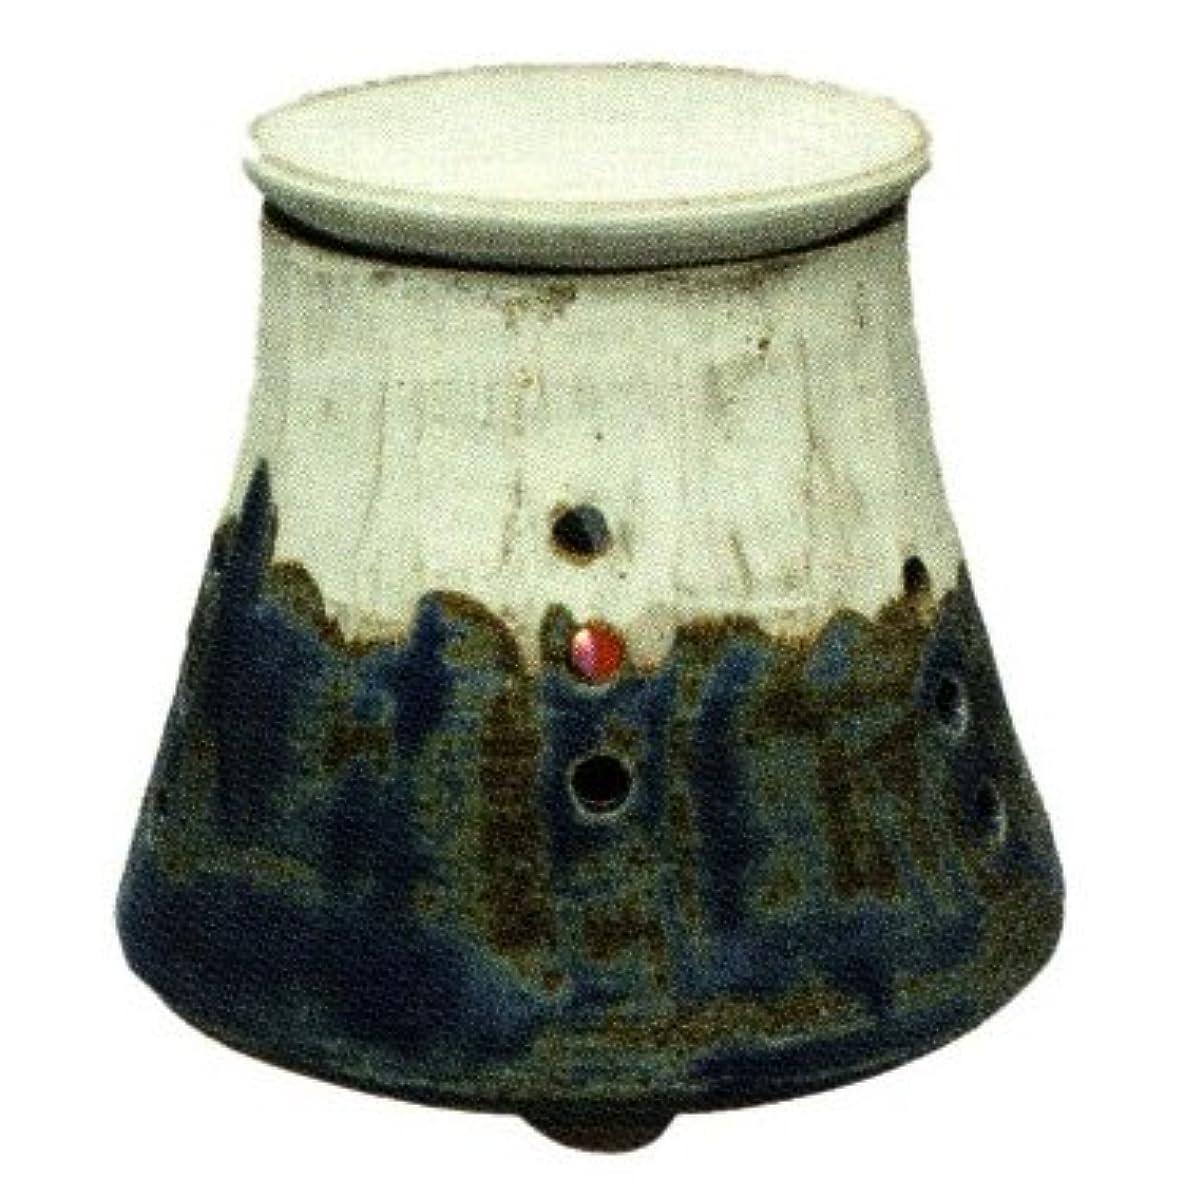 追記元気な走る常滑焼?焜清 カ39-01 茶香炉 青富士 径10.5×9.5cm